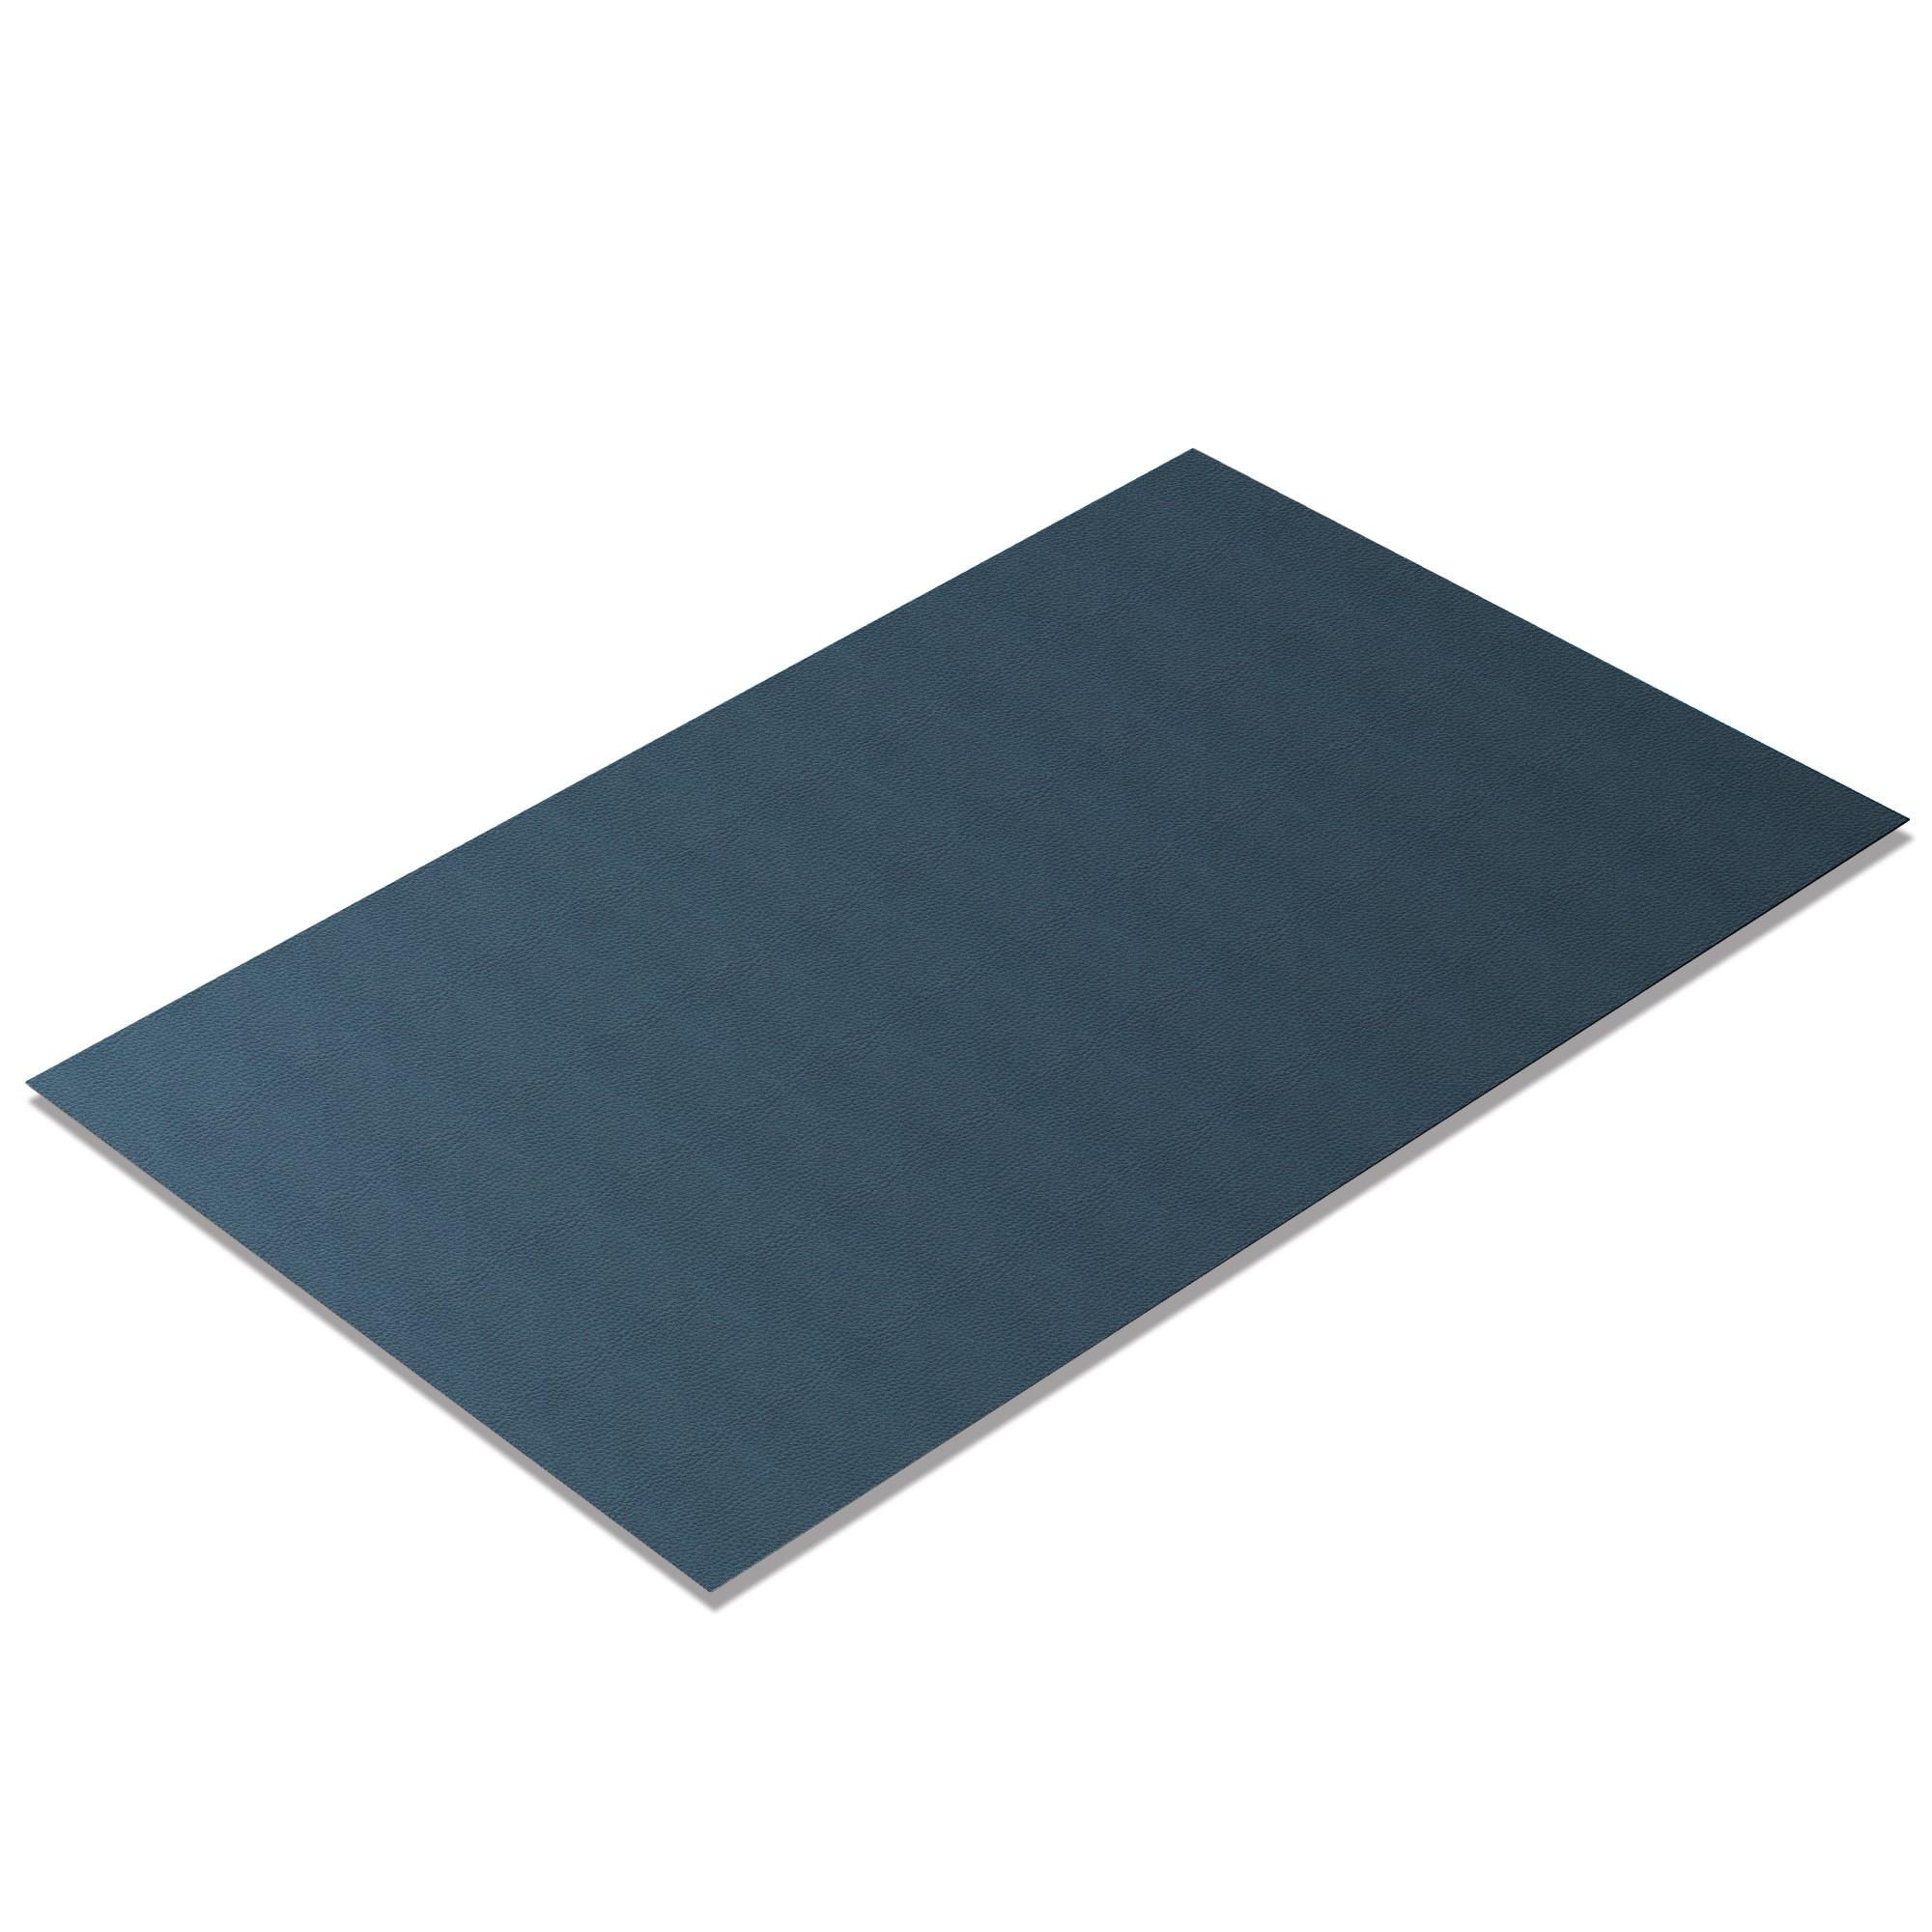 kunstleder meterware nappa style dunkelblau nst00. Black Bedroom Furniture Sets. Home Design Ideas